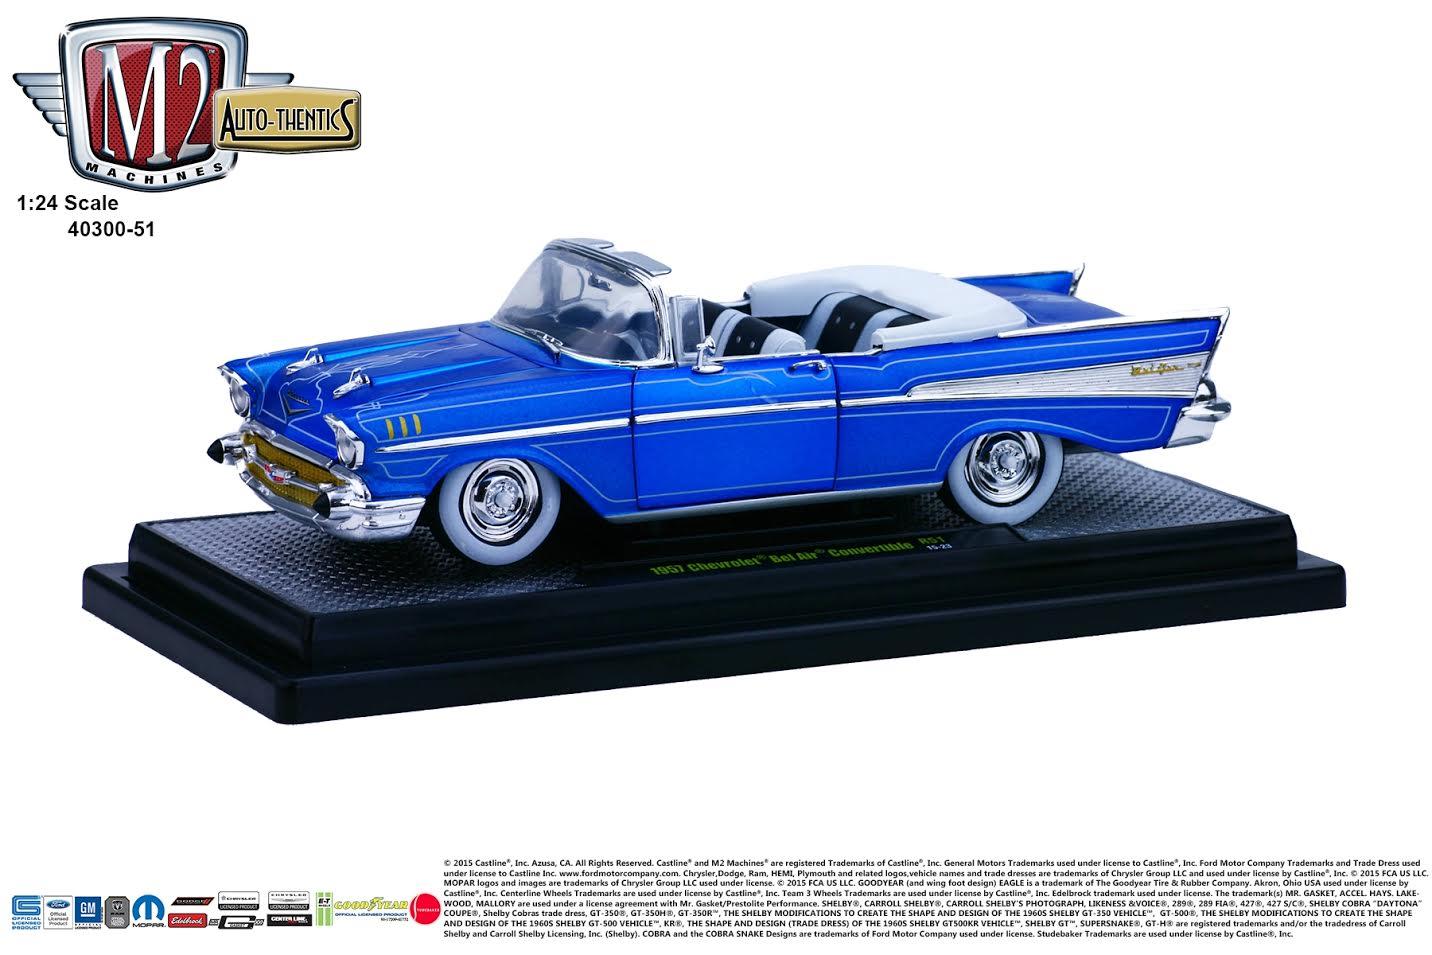 Diecast Cars 1 64 Modellautos 164 Modellbilar Mrz 2016 1957 Chevy Bel Air Convertible Lowrider M2 Machines News 24 Release 51a B Chevrolet